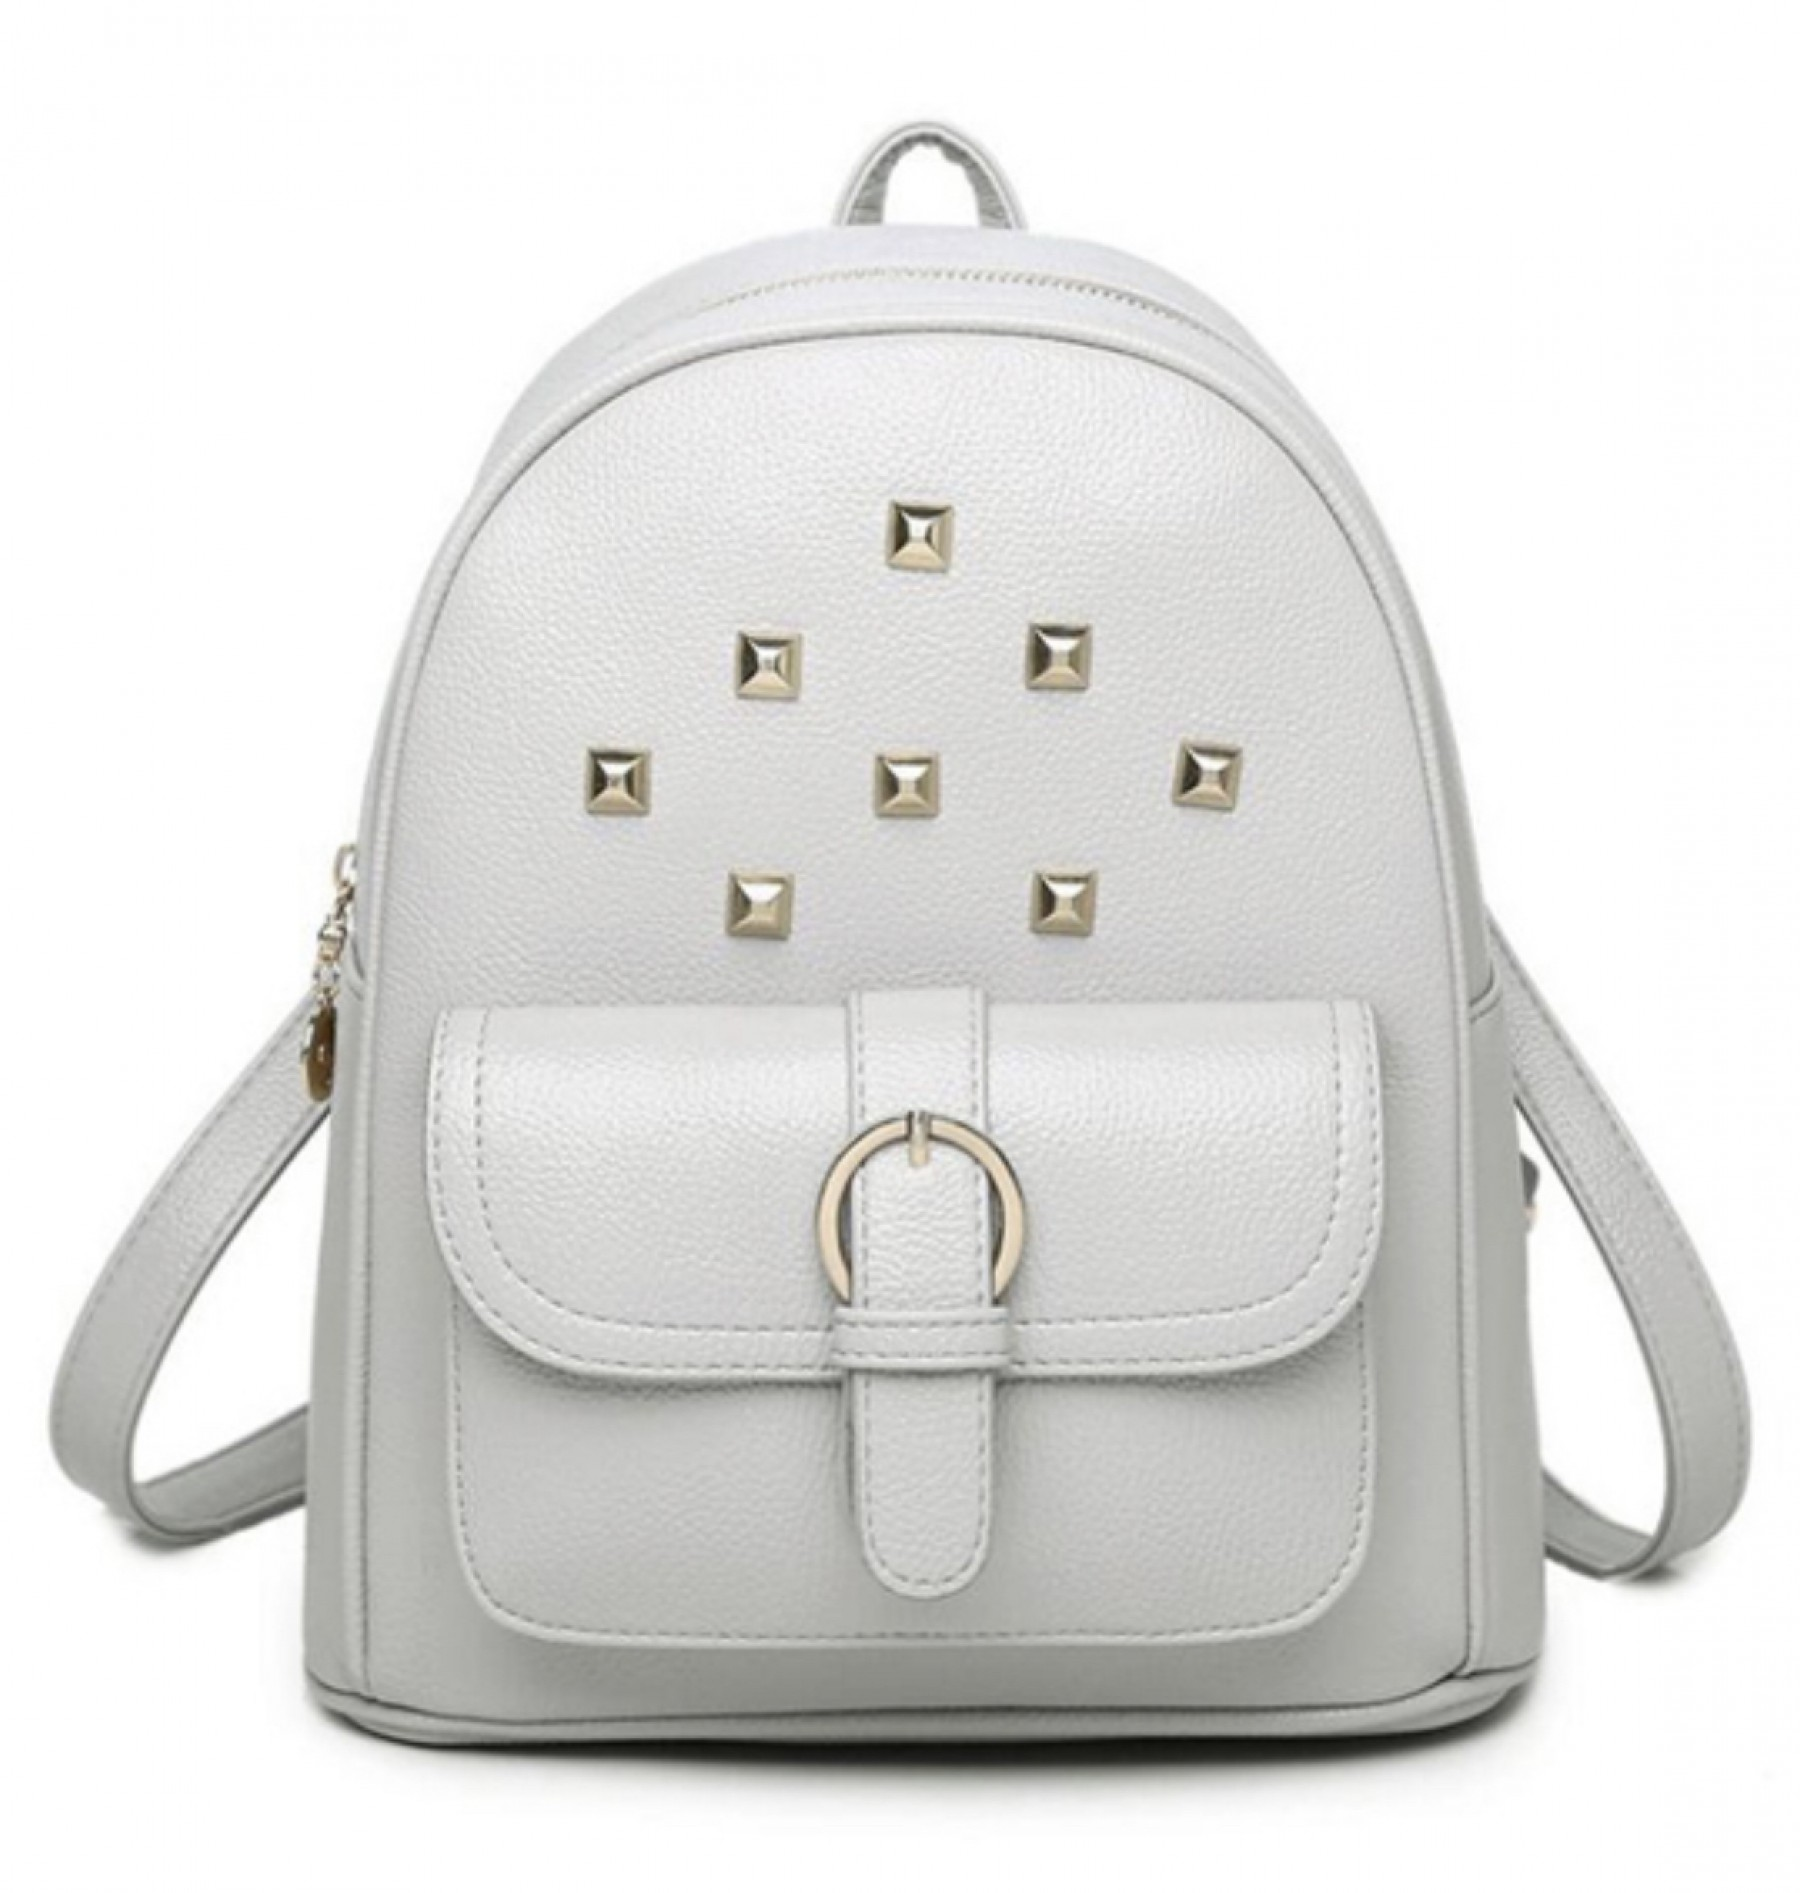 SE3-BP083- Women's Trendy Mini Studded Backpack Purse (Grey)